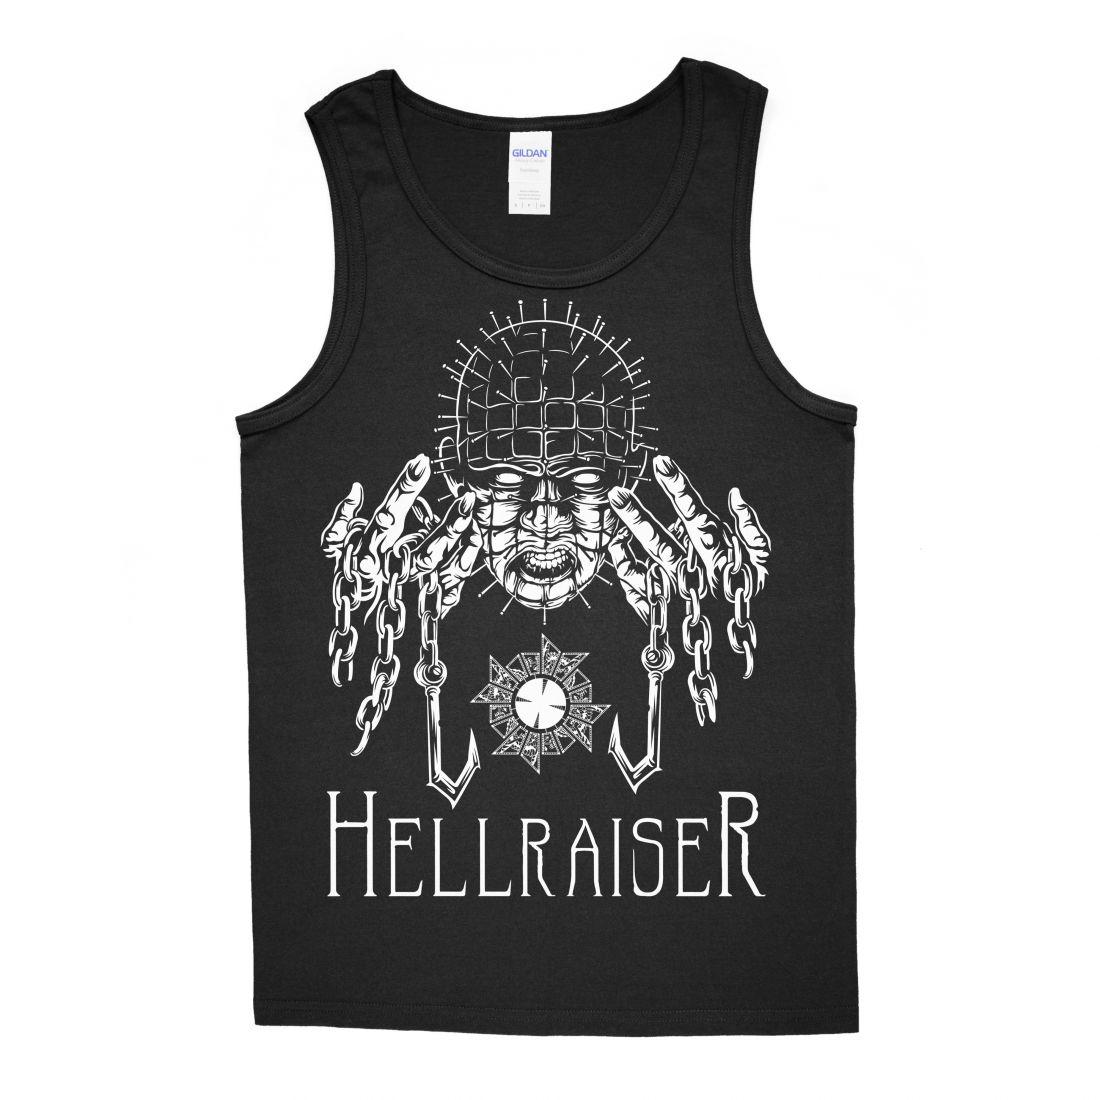 Hellraiser 001